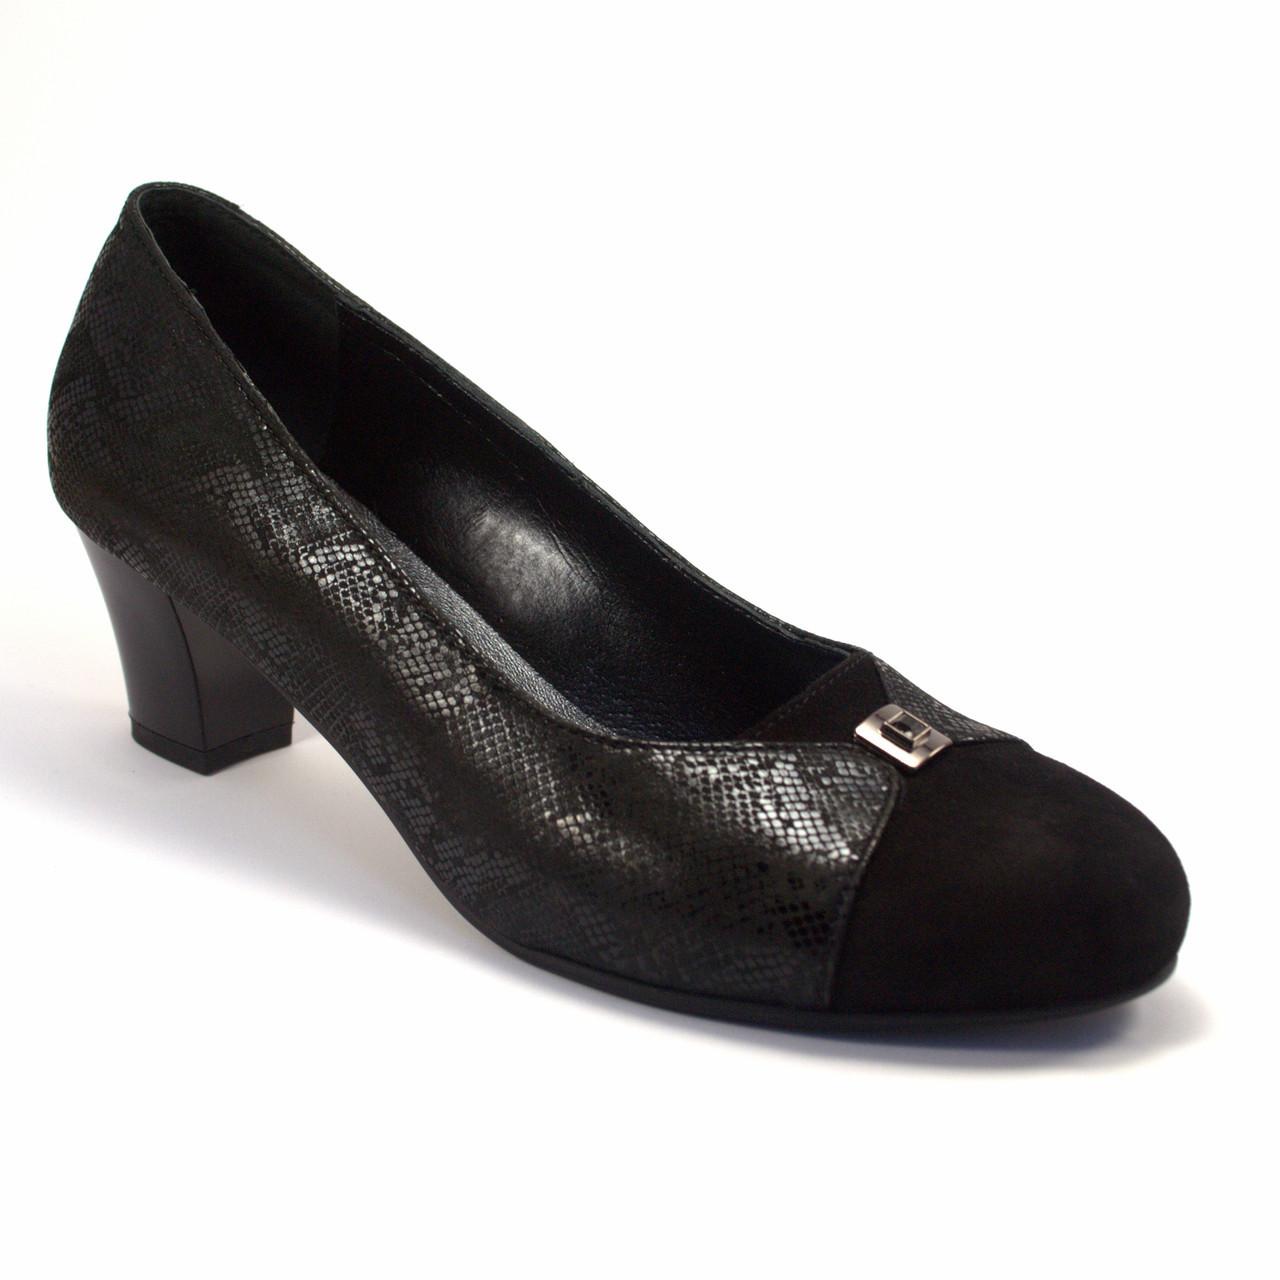 Туфли лодочка женская обувь Pyra Silver Black Lether Scales by Rosso Avangard цвет черный